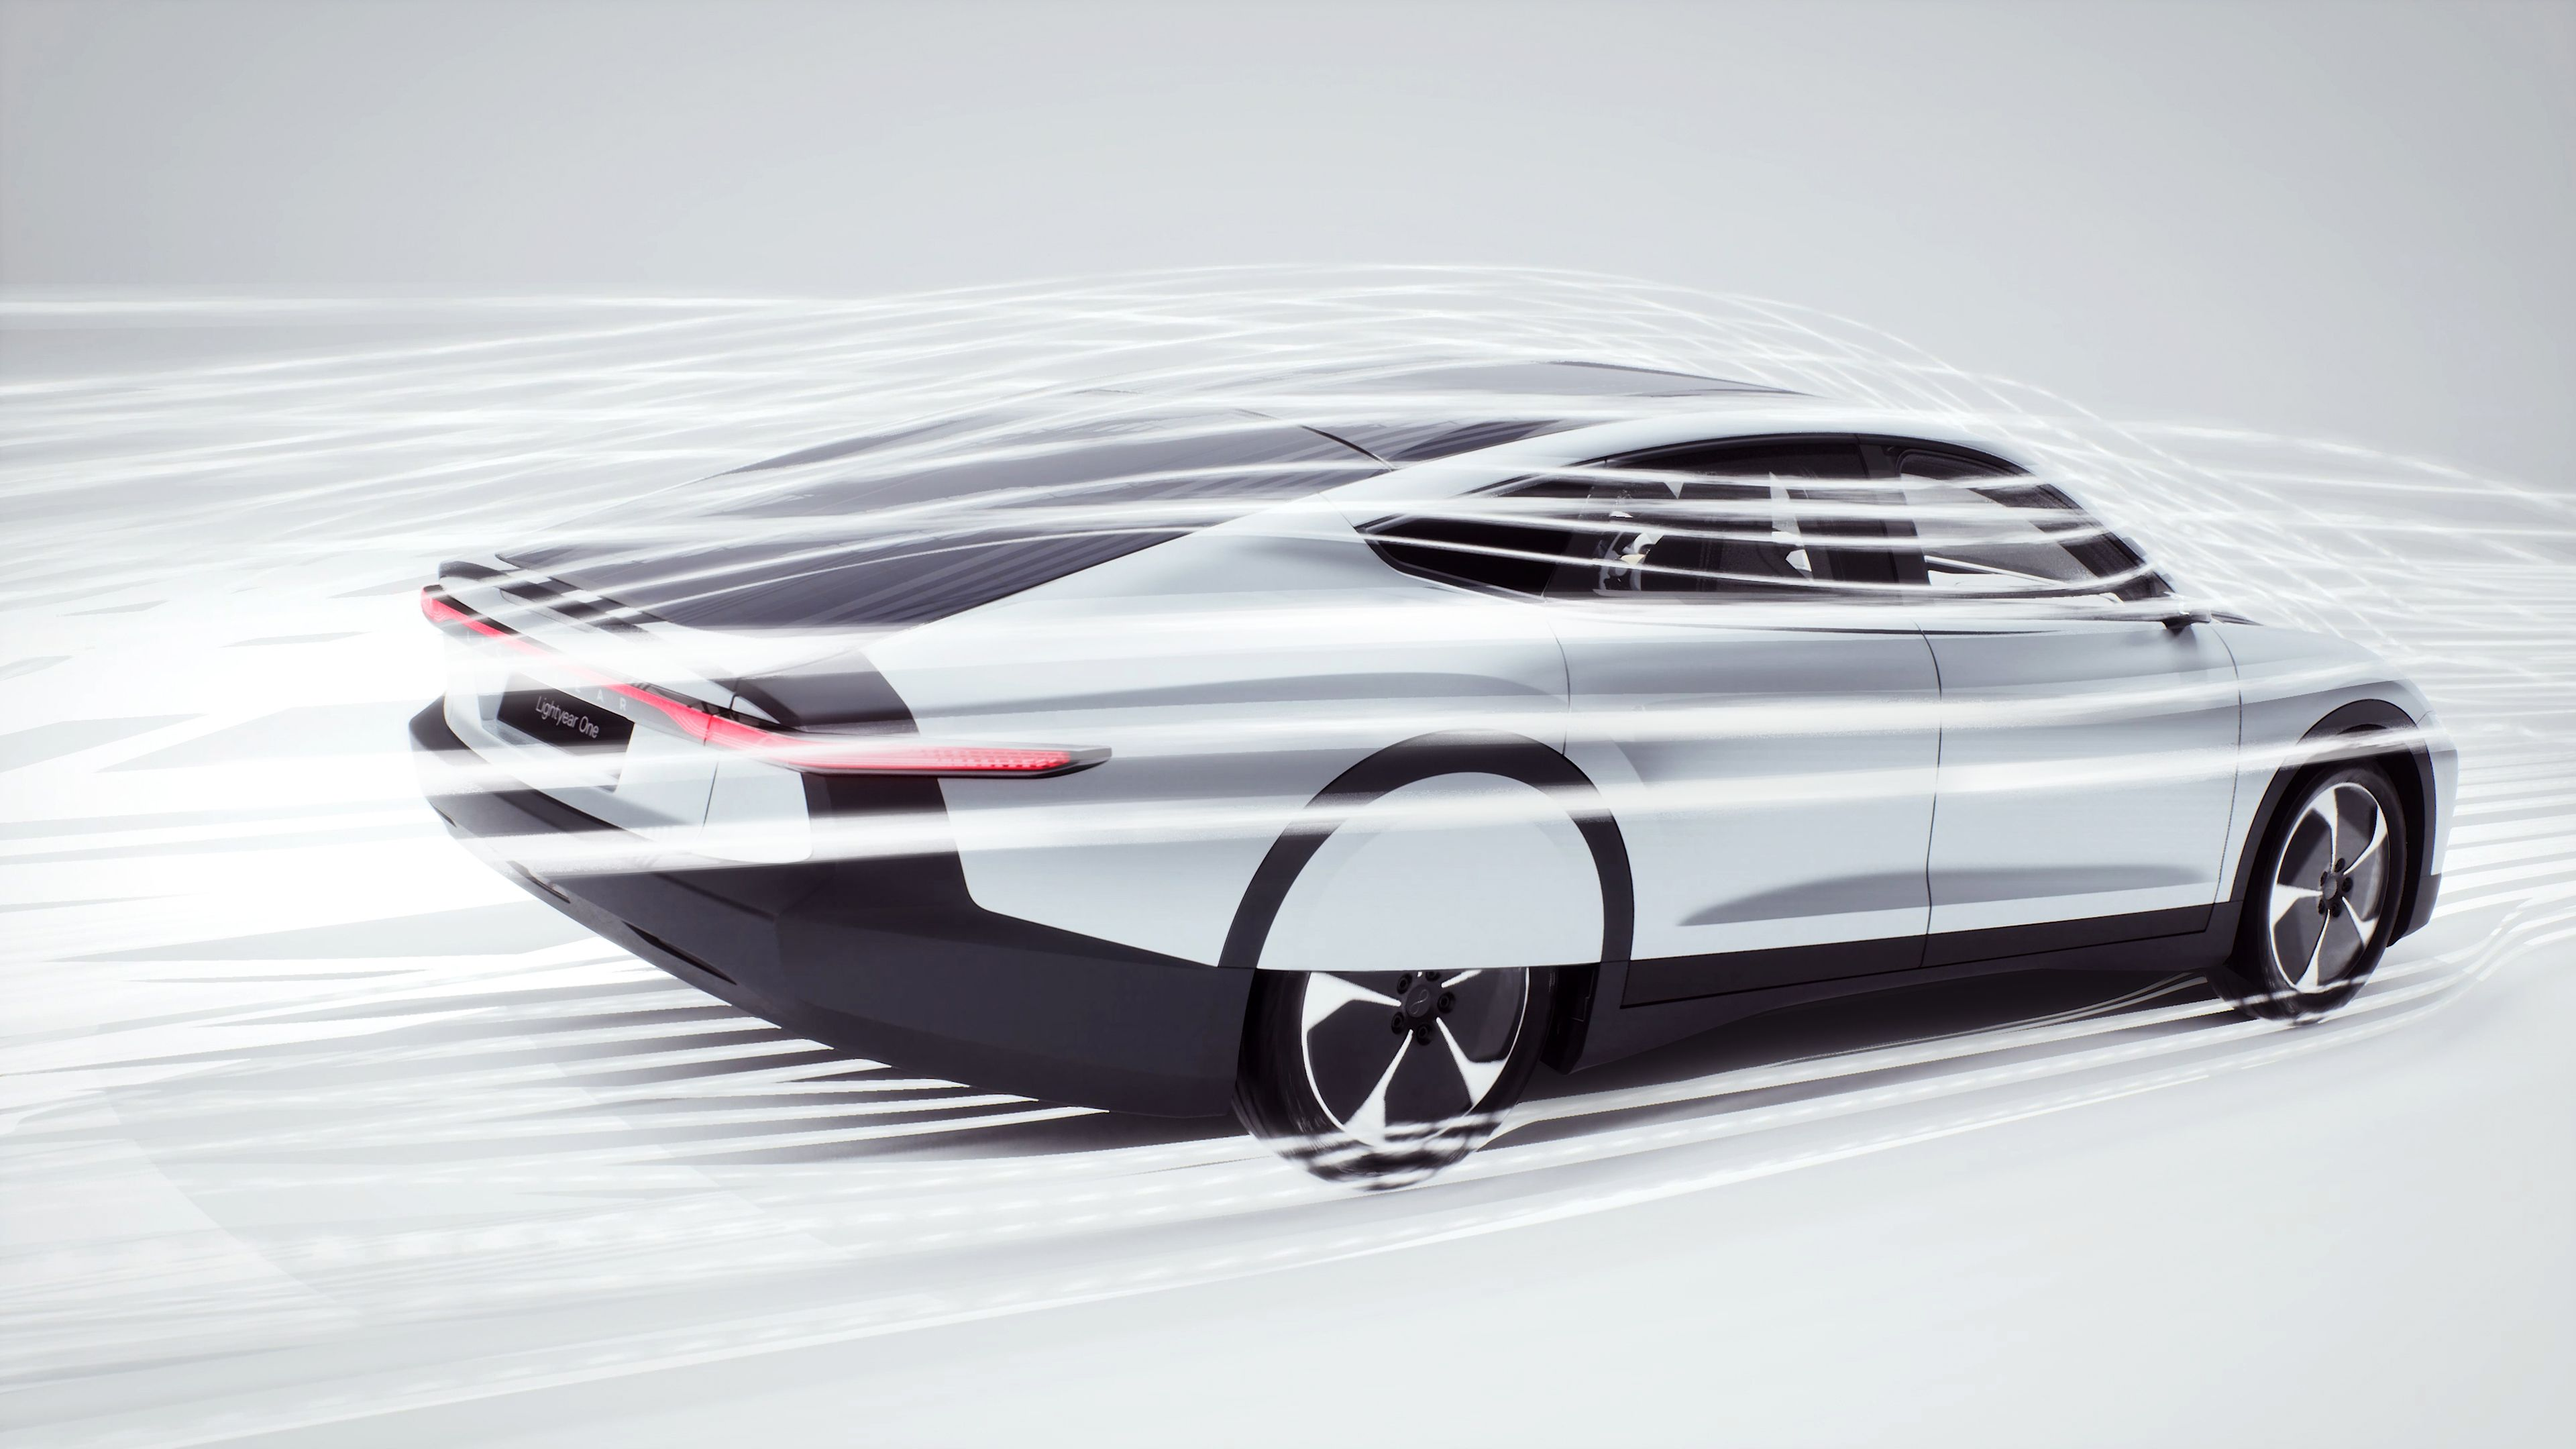 Lightyear One skal være en ekstremt aerodynamisk bil.